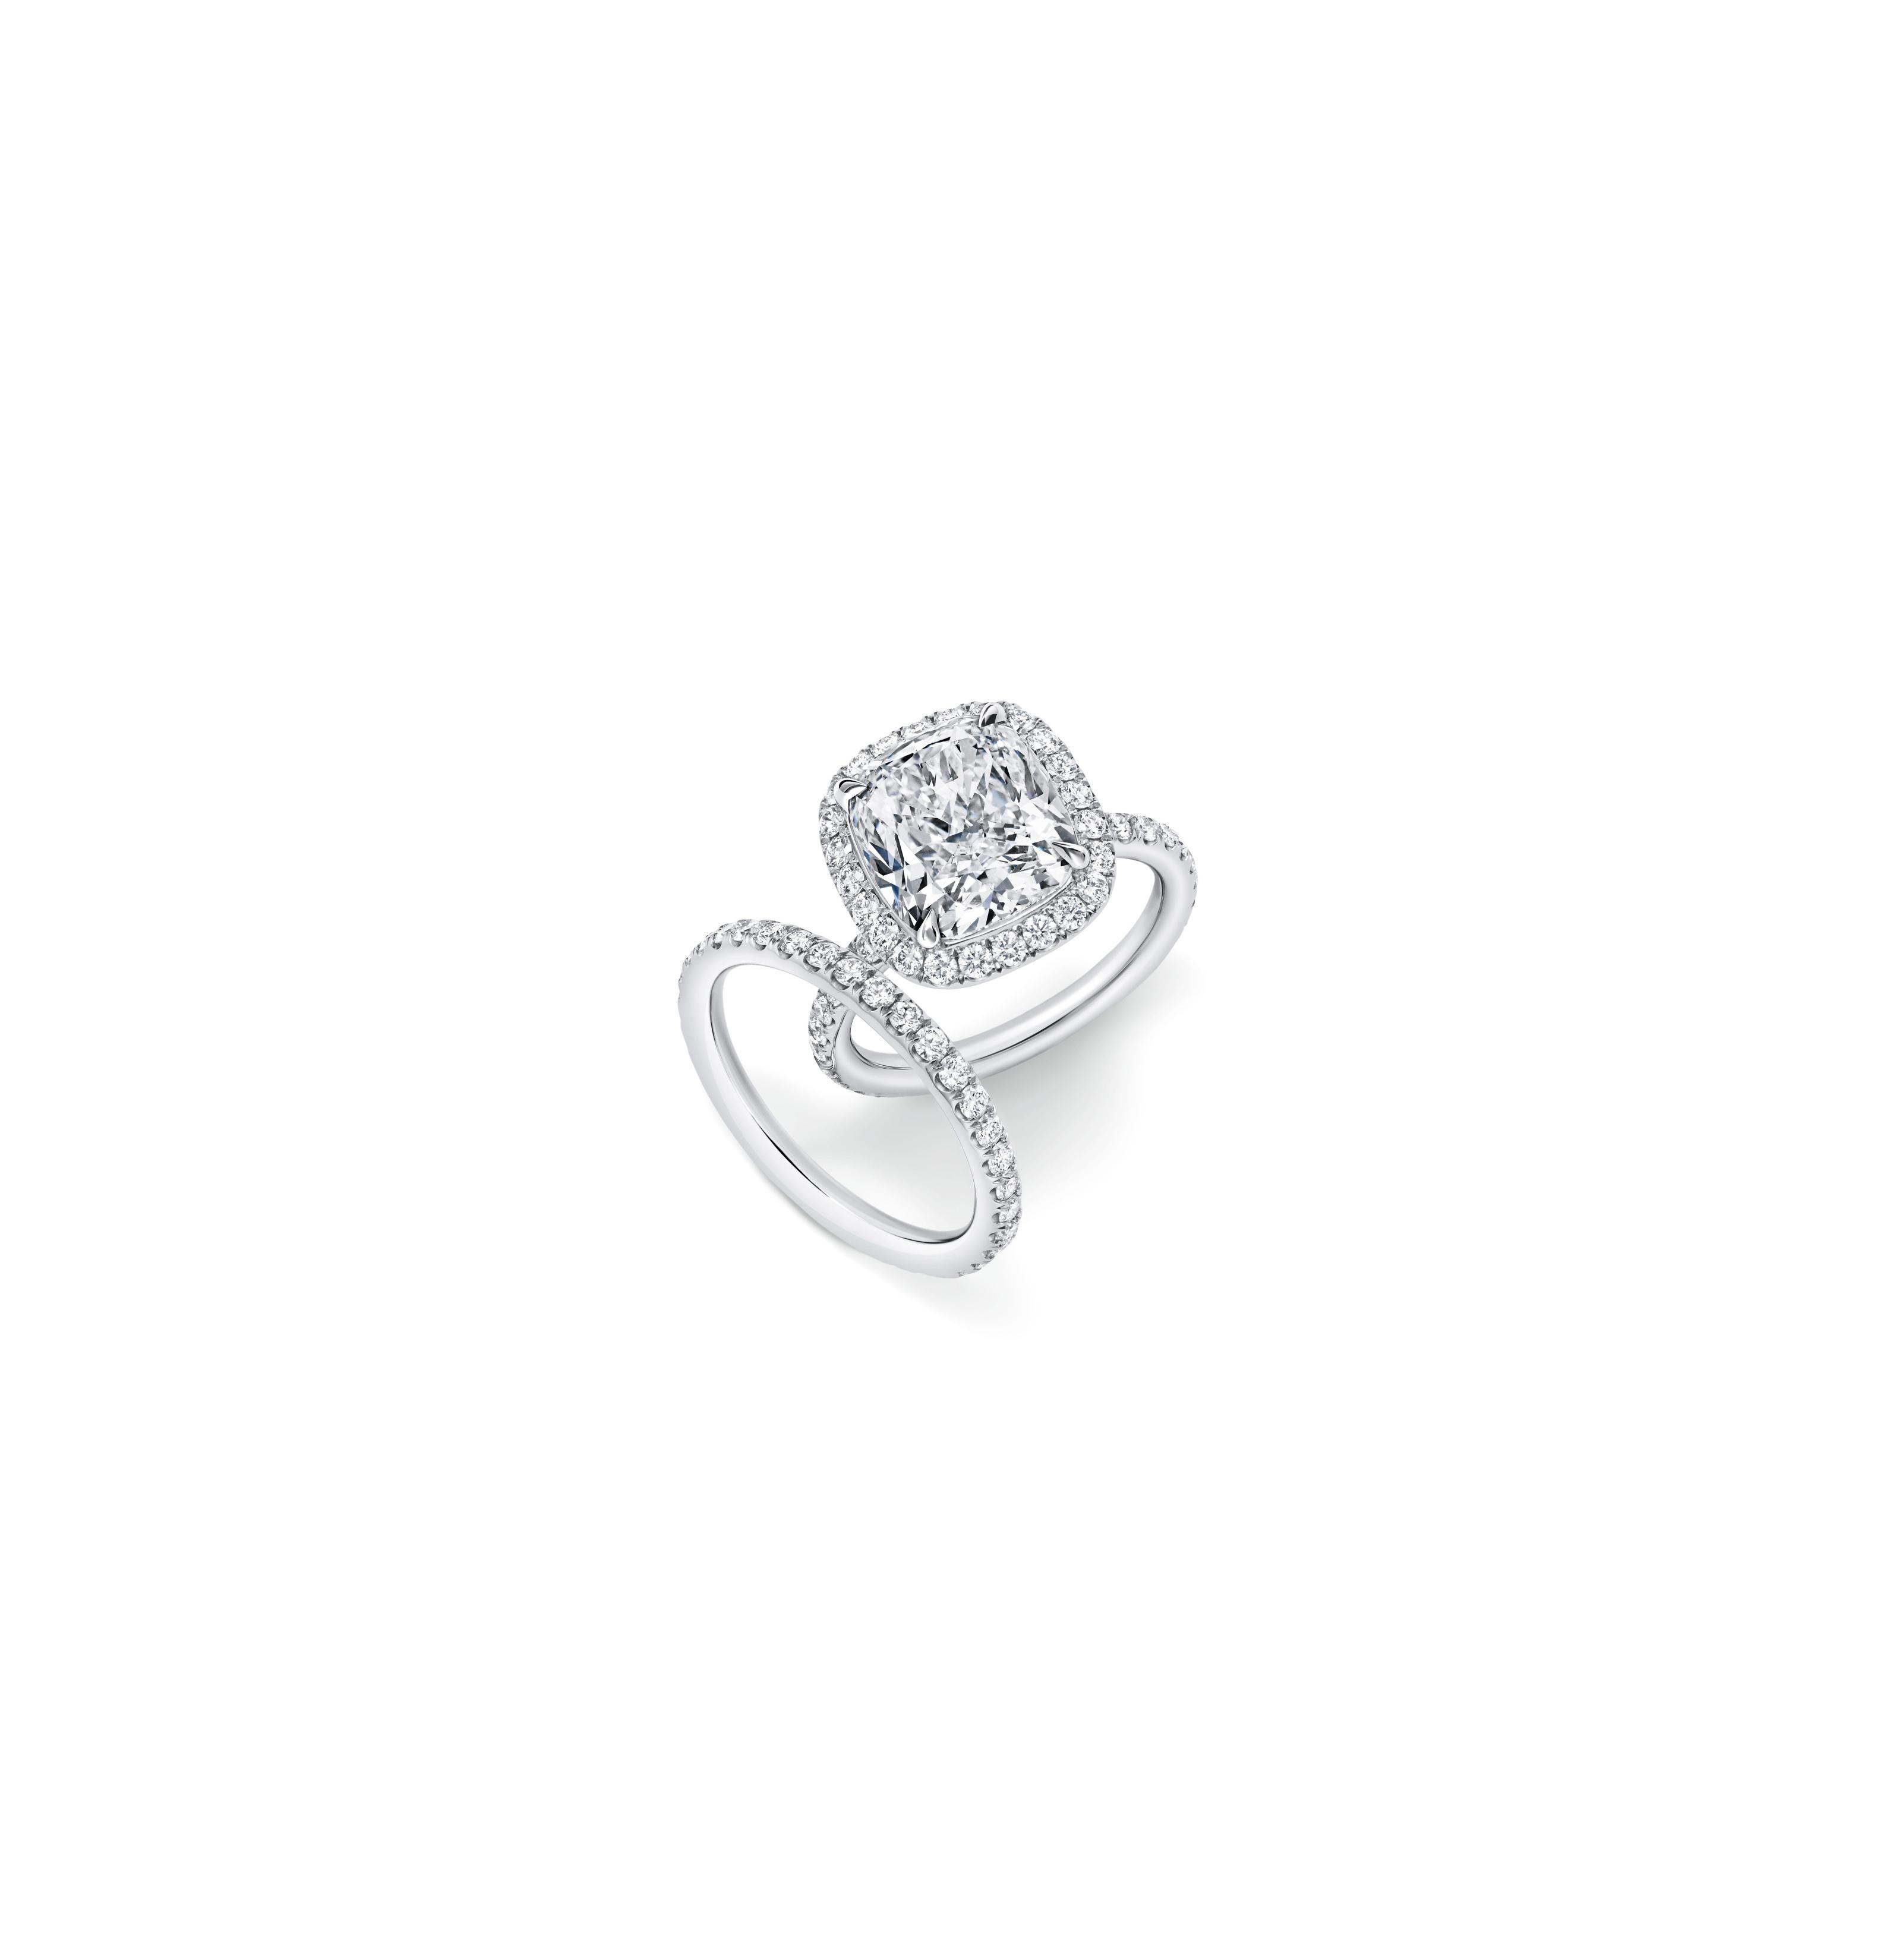 Cushion Cut Diamond Engagement Rings | Martha Stewart Weddings Within Cushion Cut Yellow Diamond Micropavé Rings (View 9 of 25)